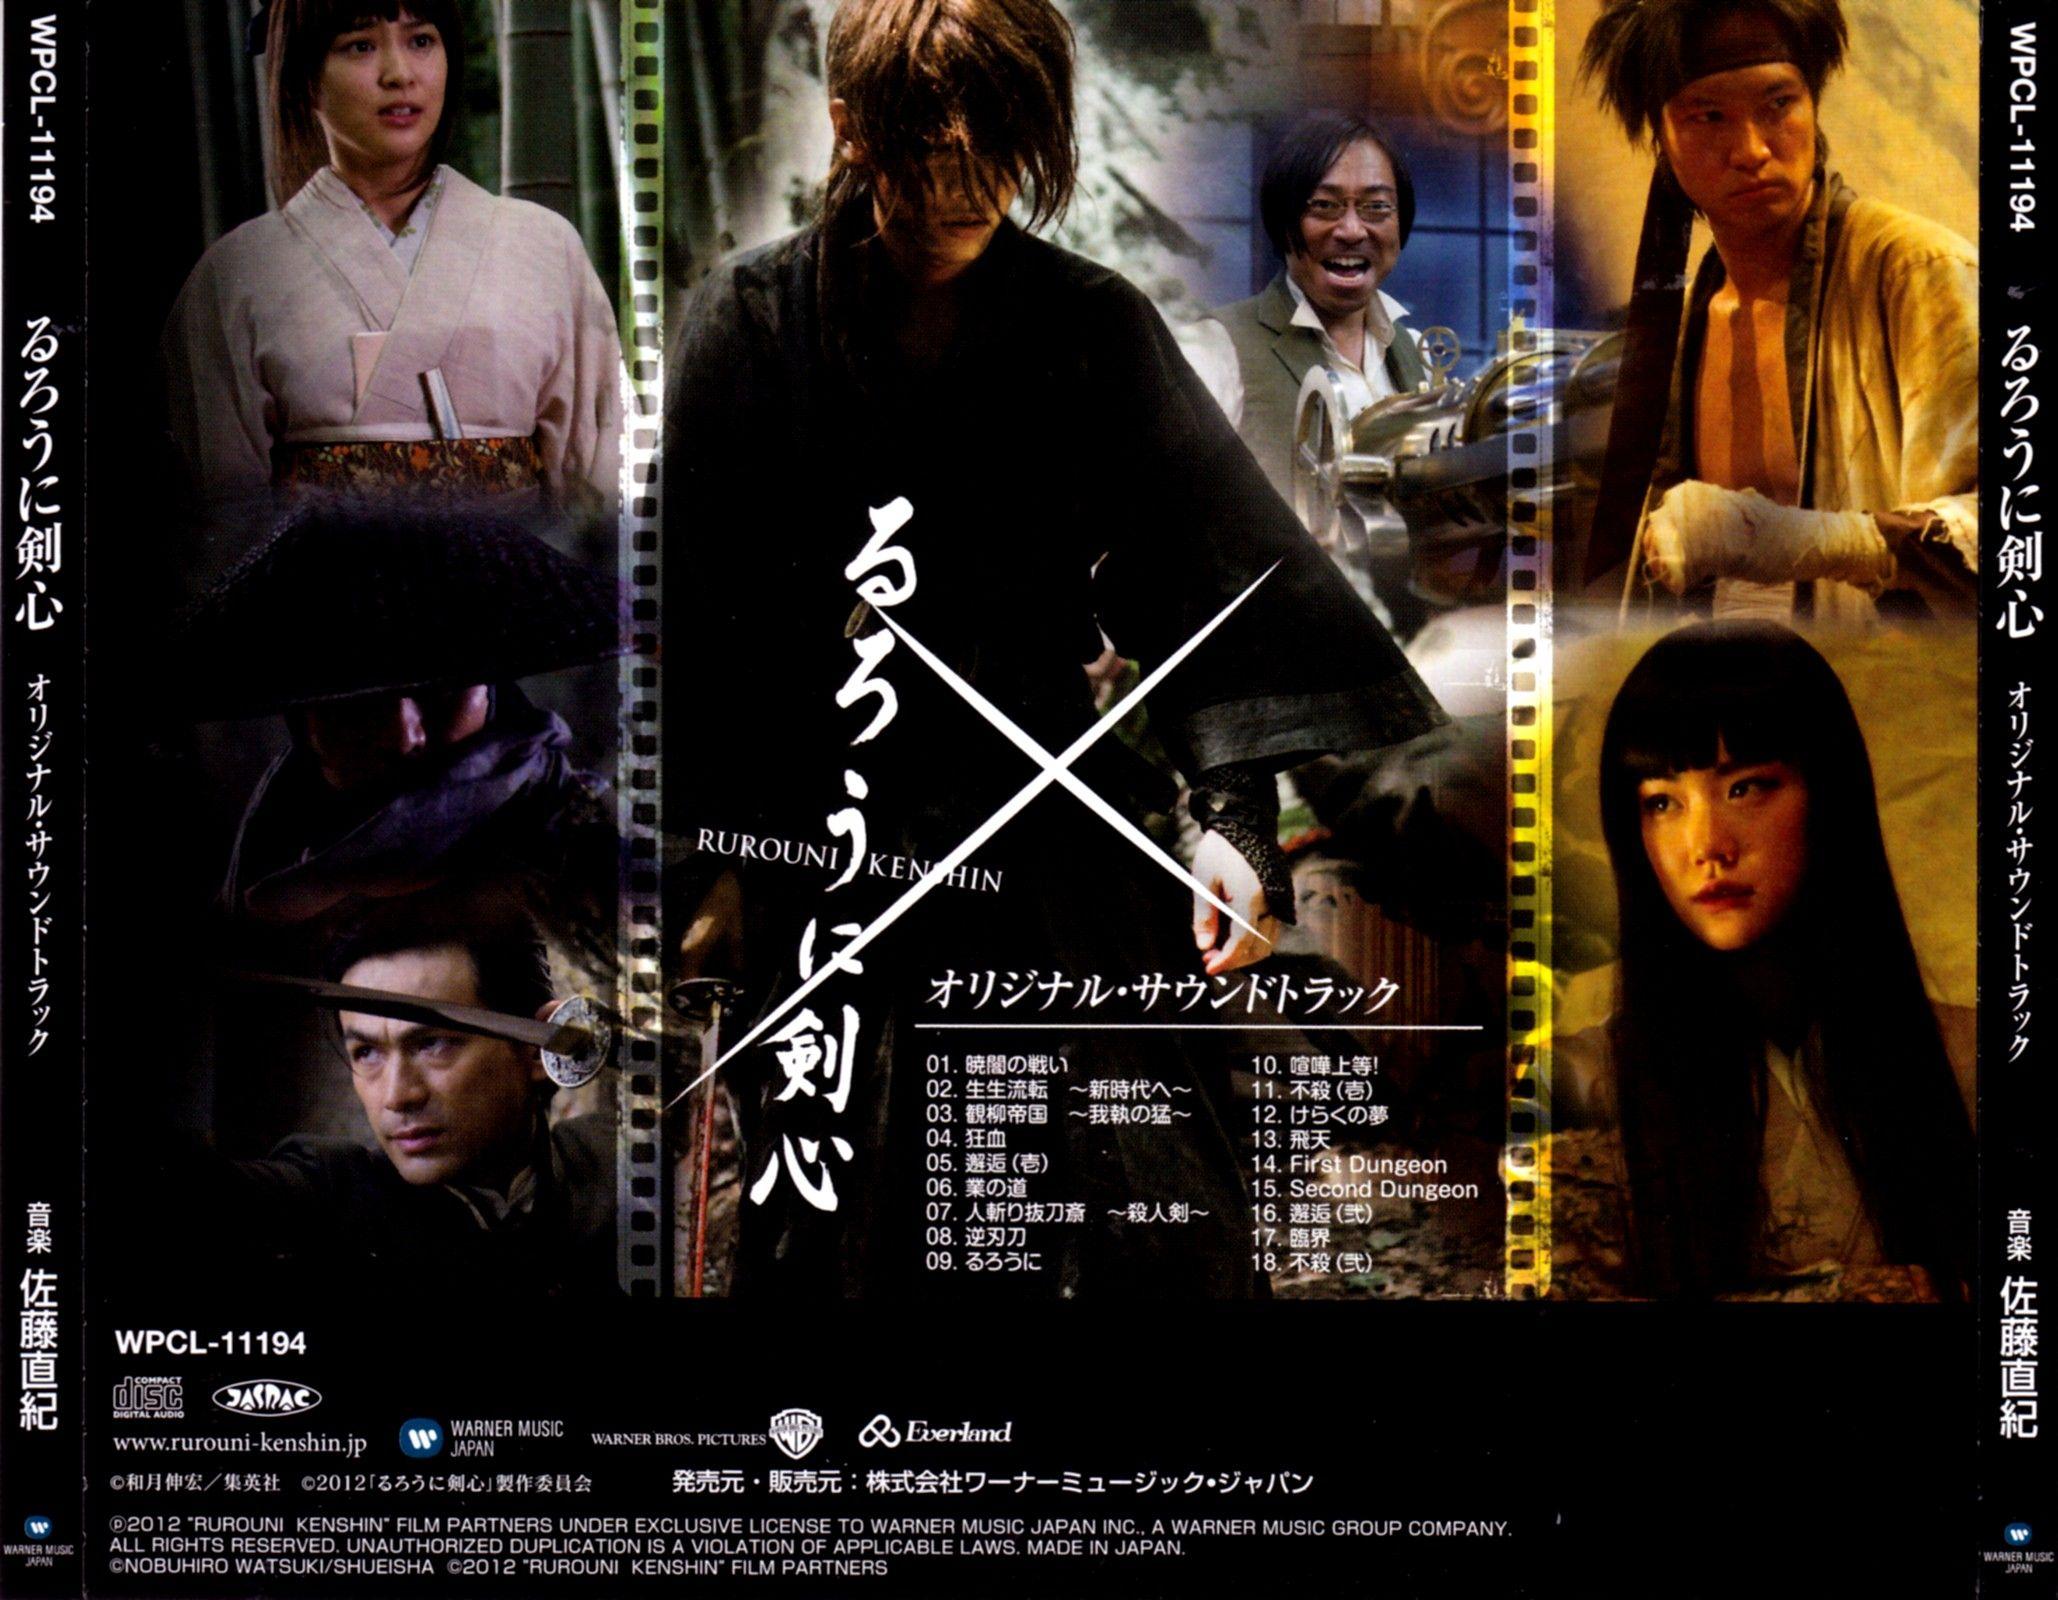 Rurouni Kenshin live action album cover, Kenshin Himura ...